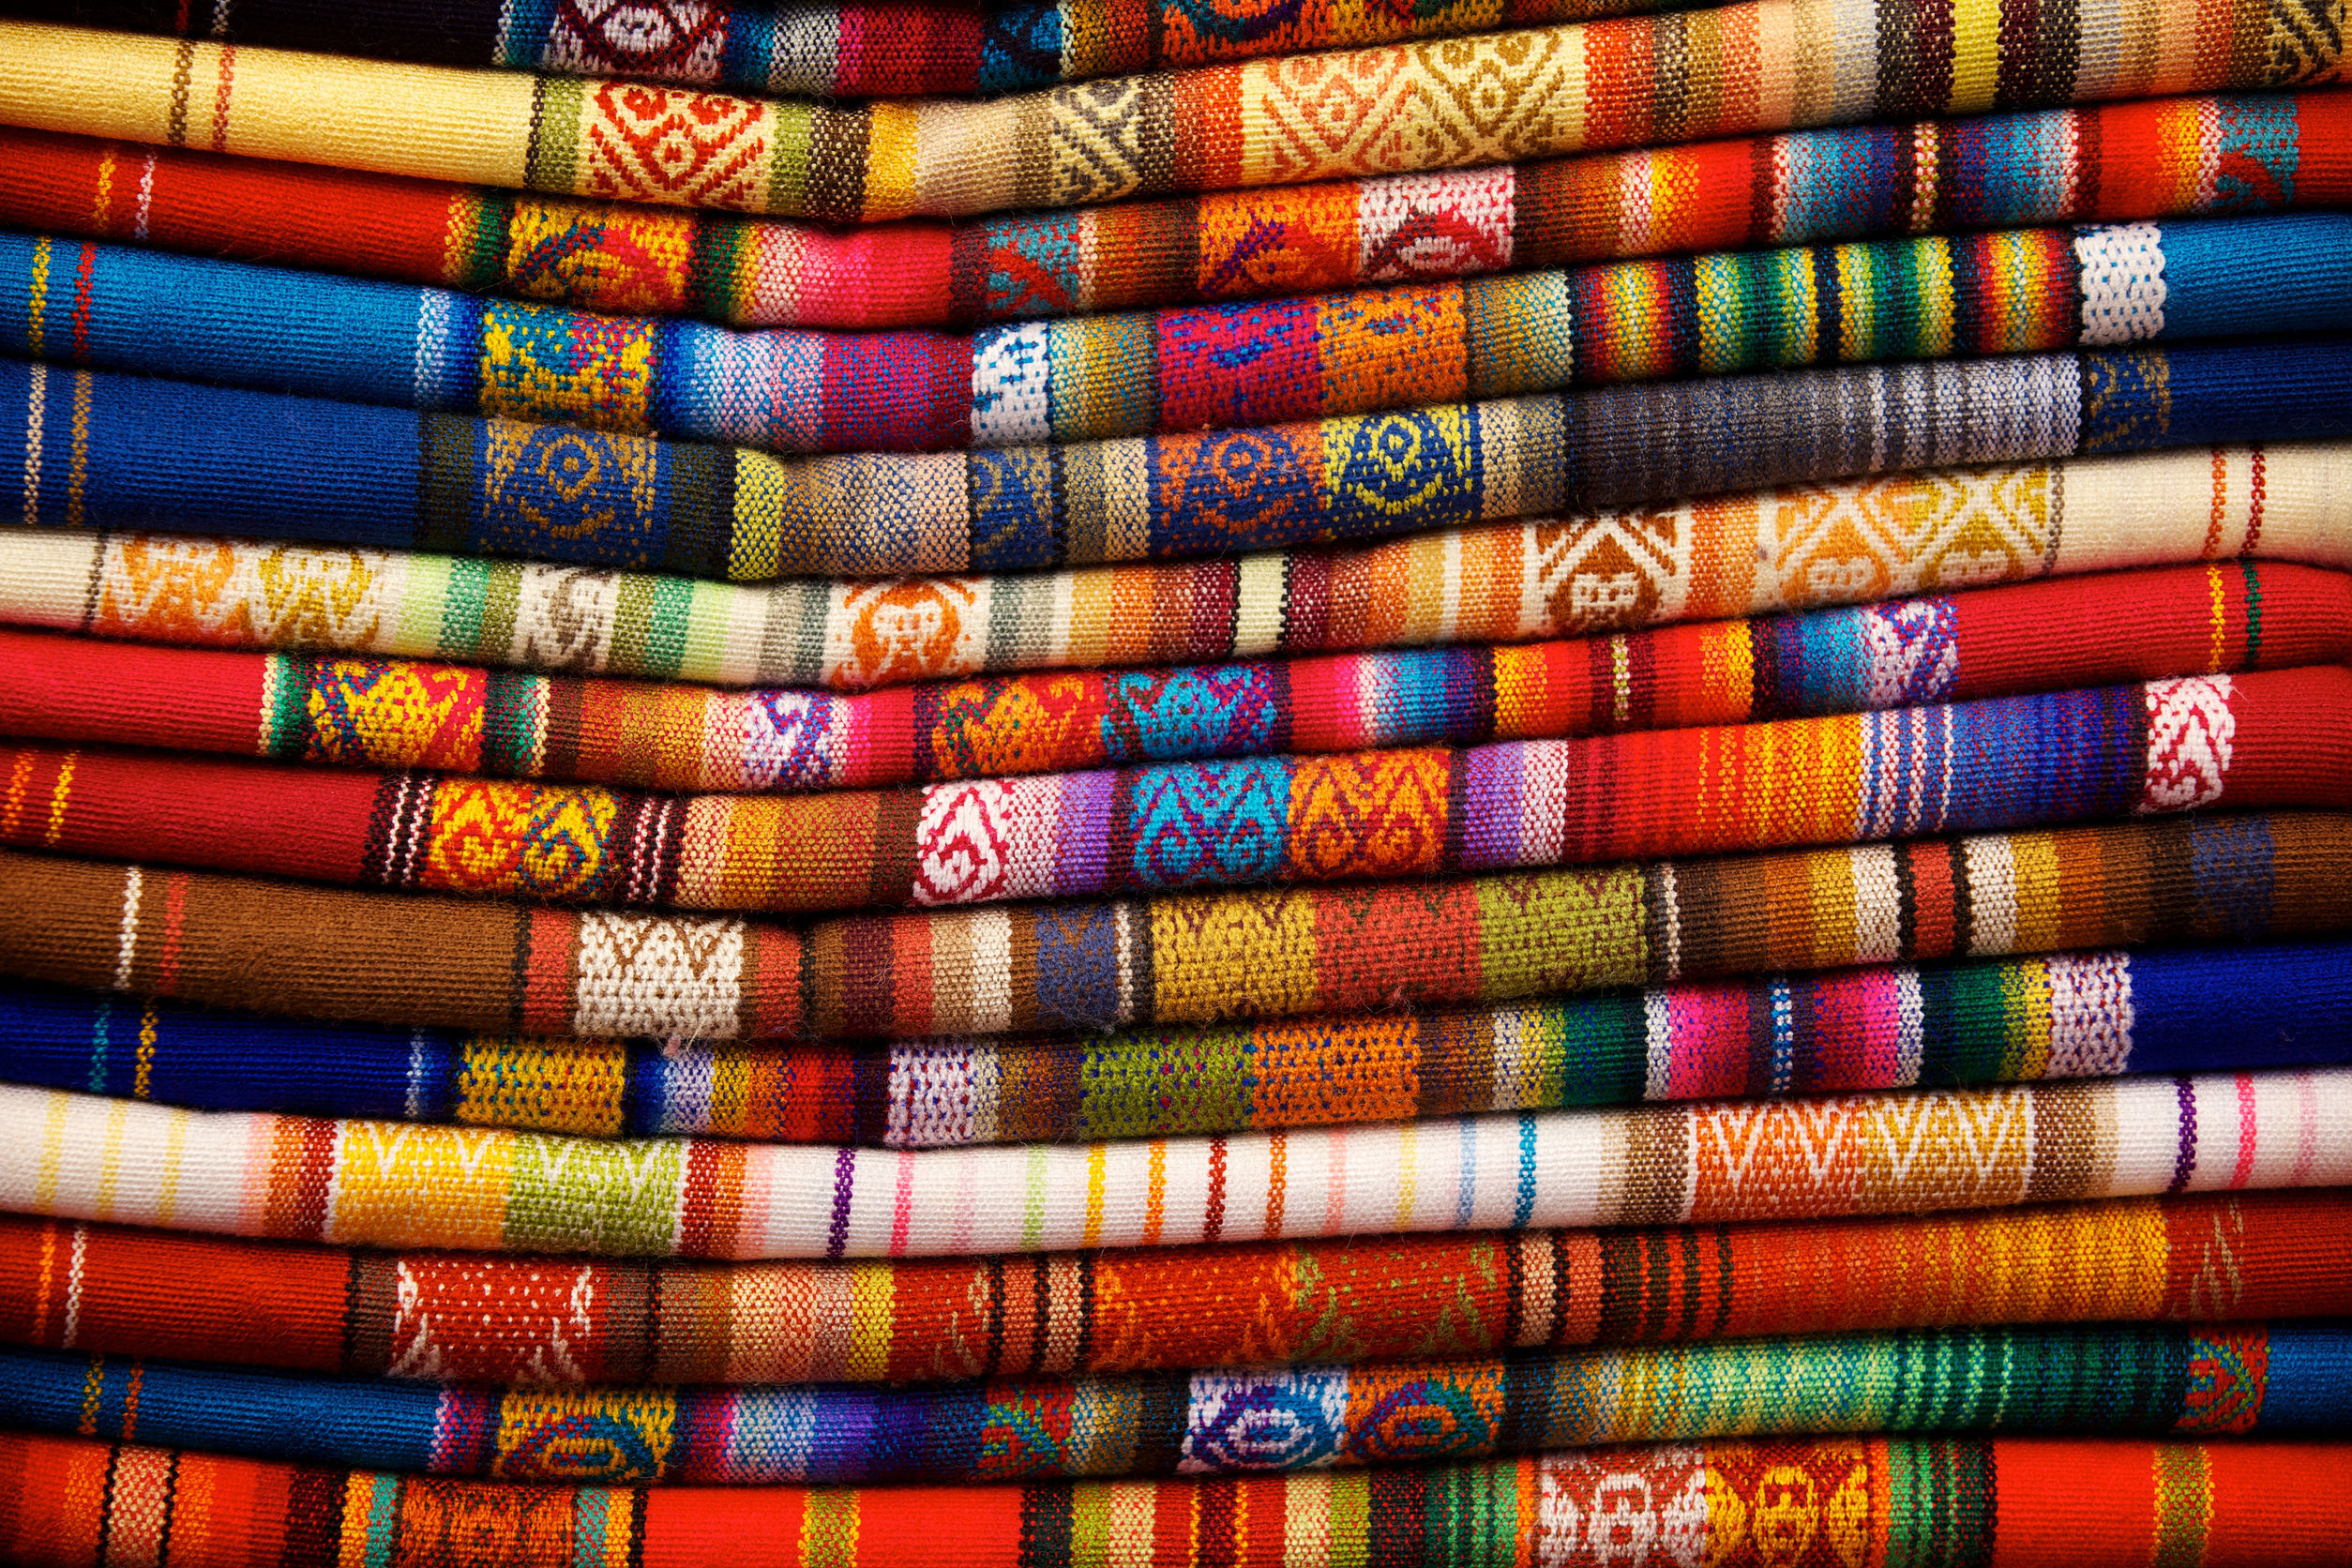 textiles-otavalo-market-ecuador